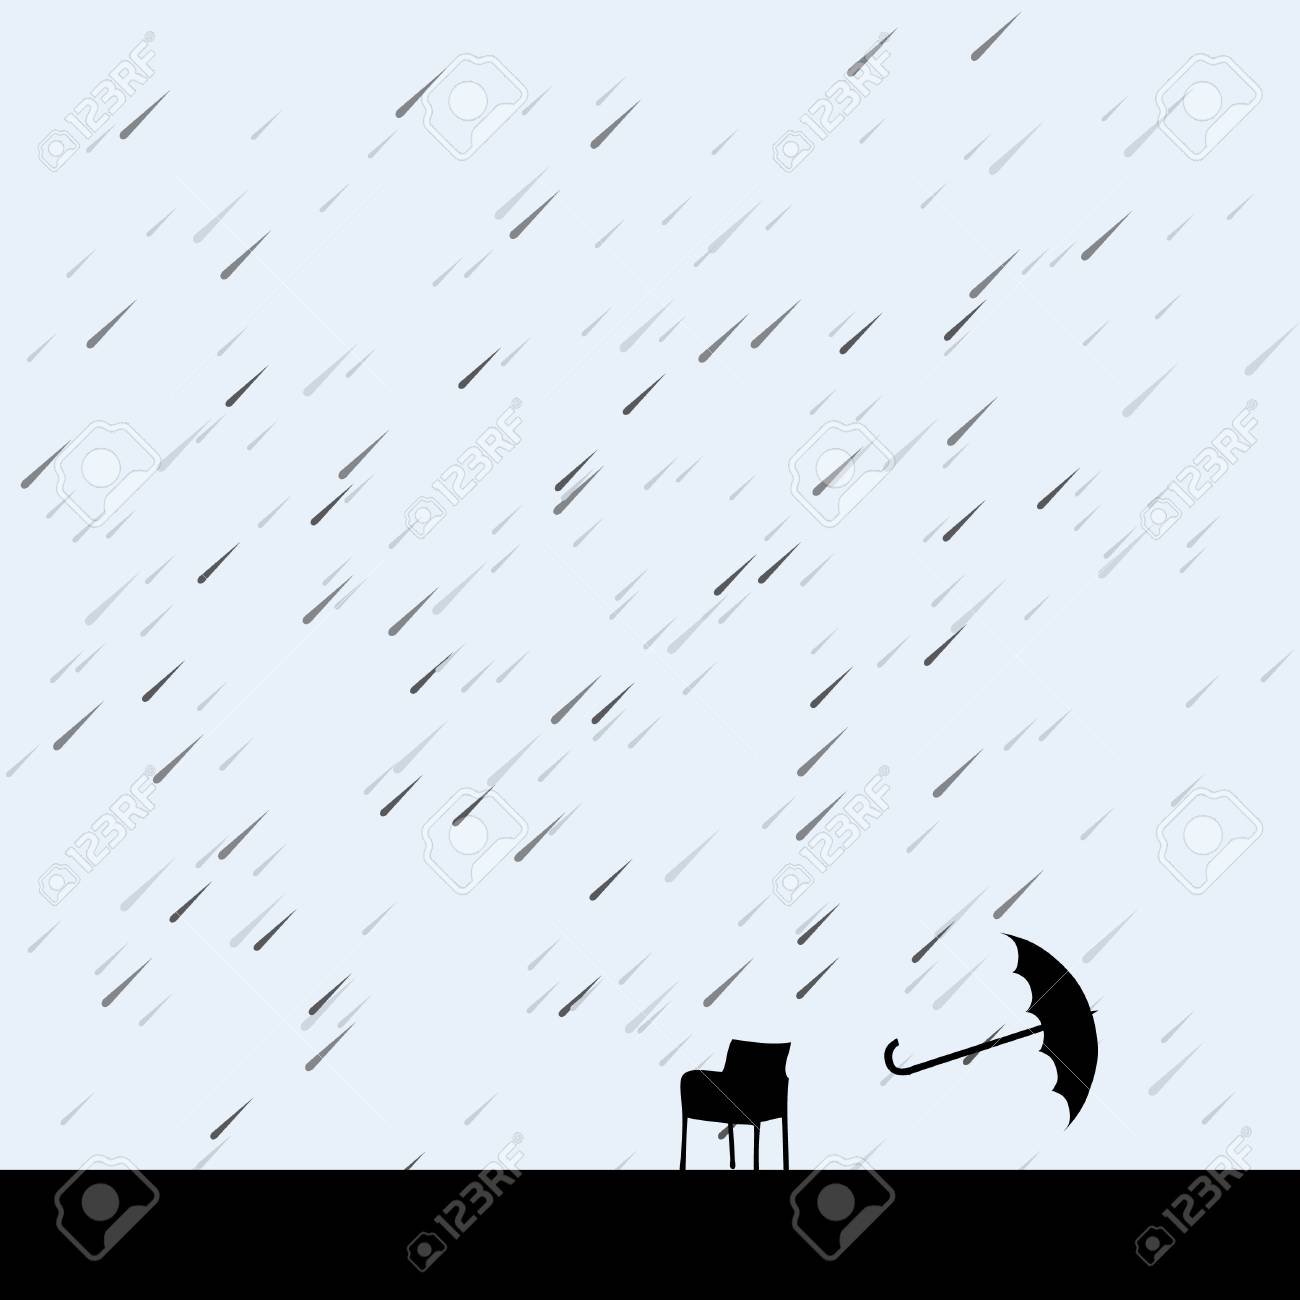 rain and umbrella over chair, vector illustration Stock Vector - 5165772